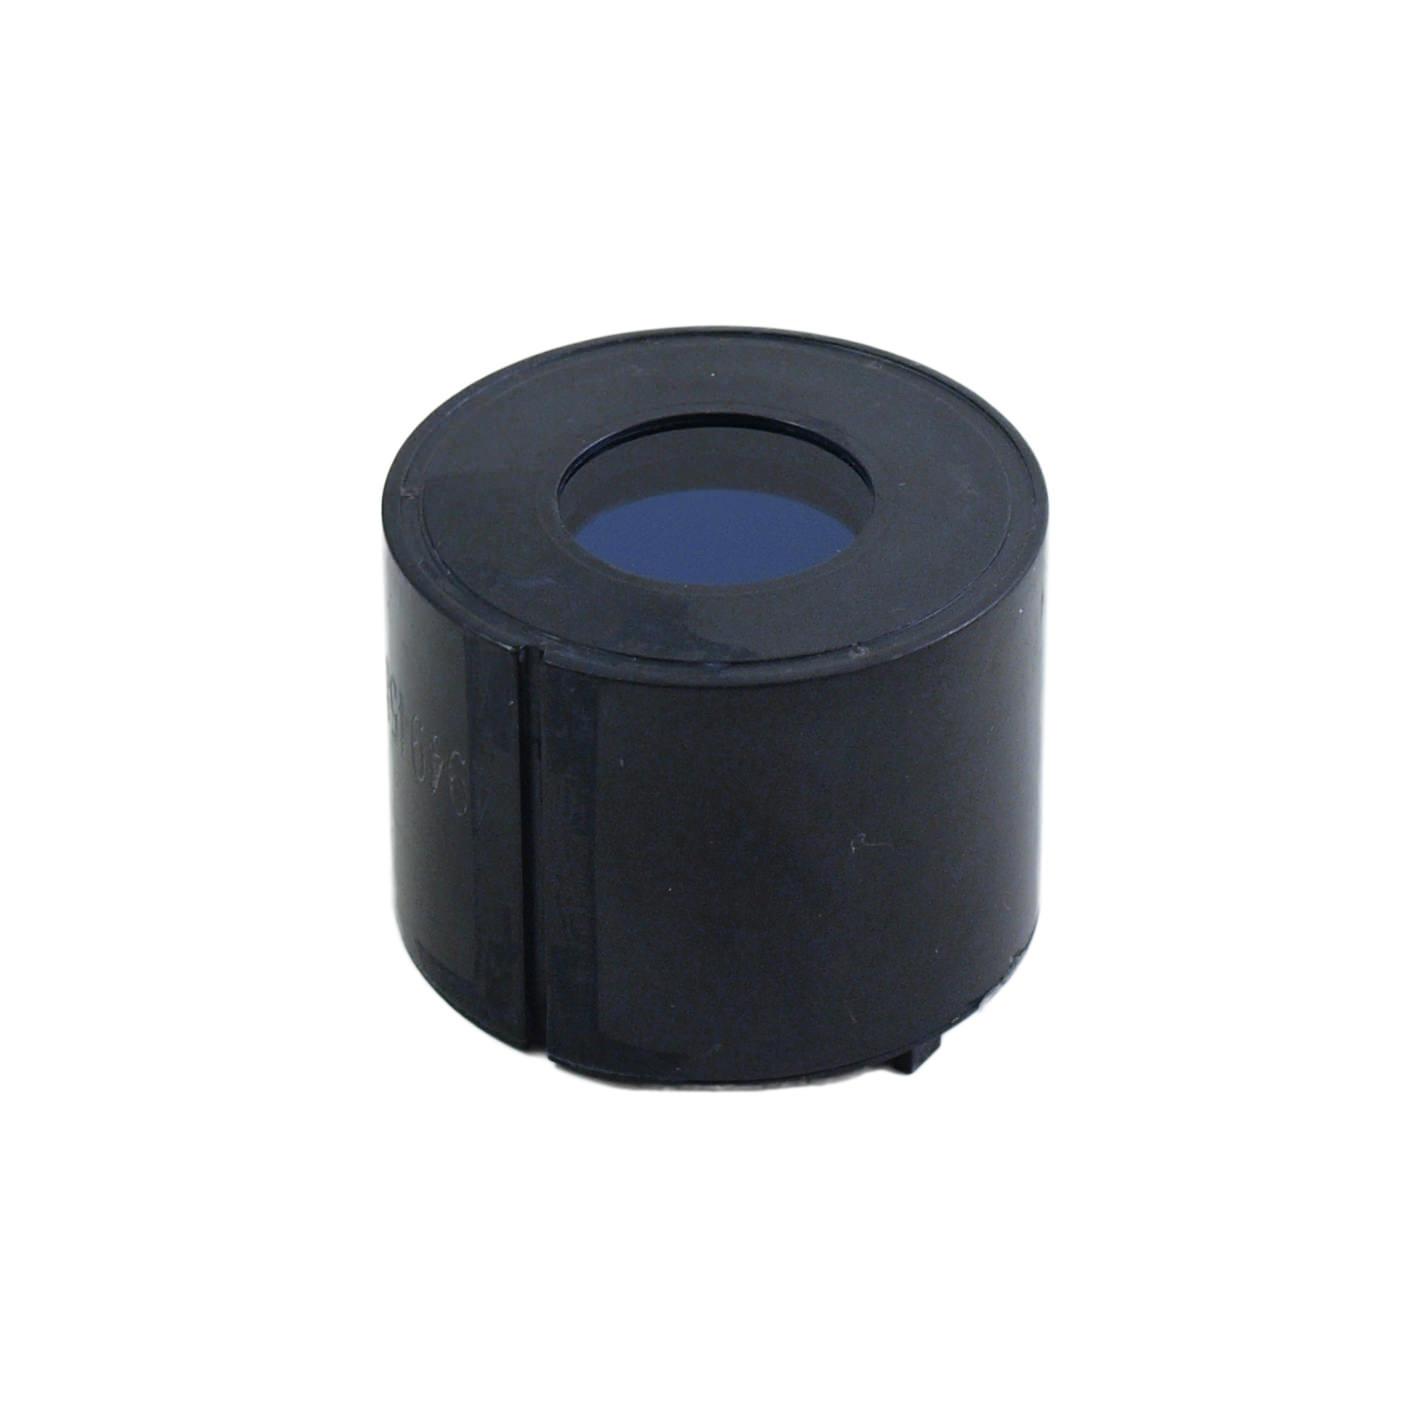 MX10130 Image Intensifier Tube